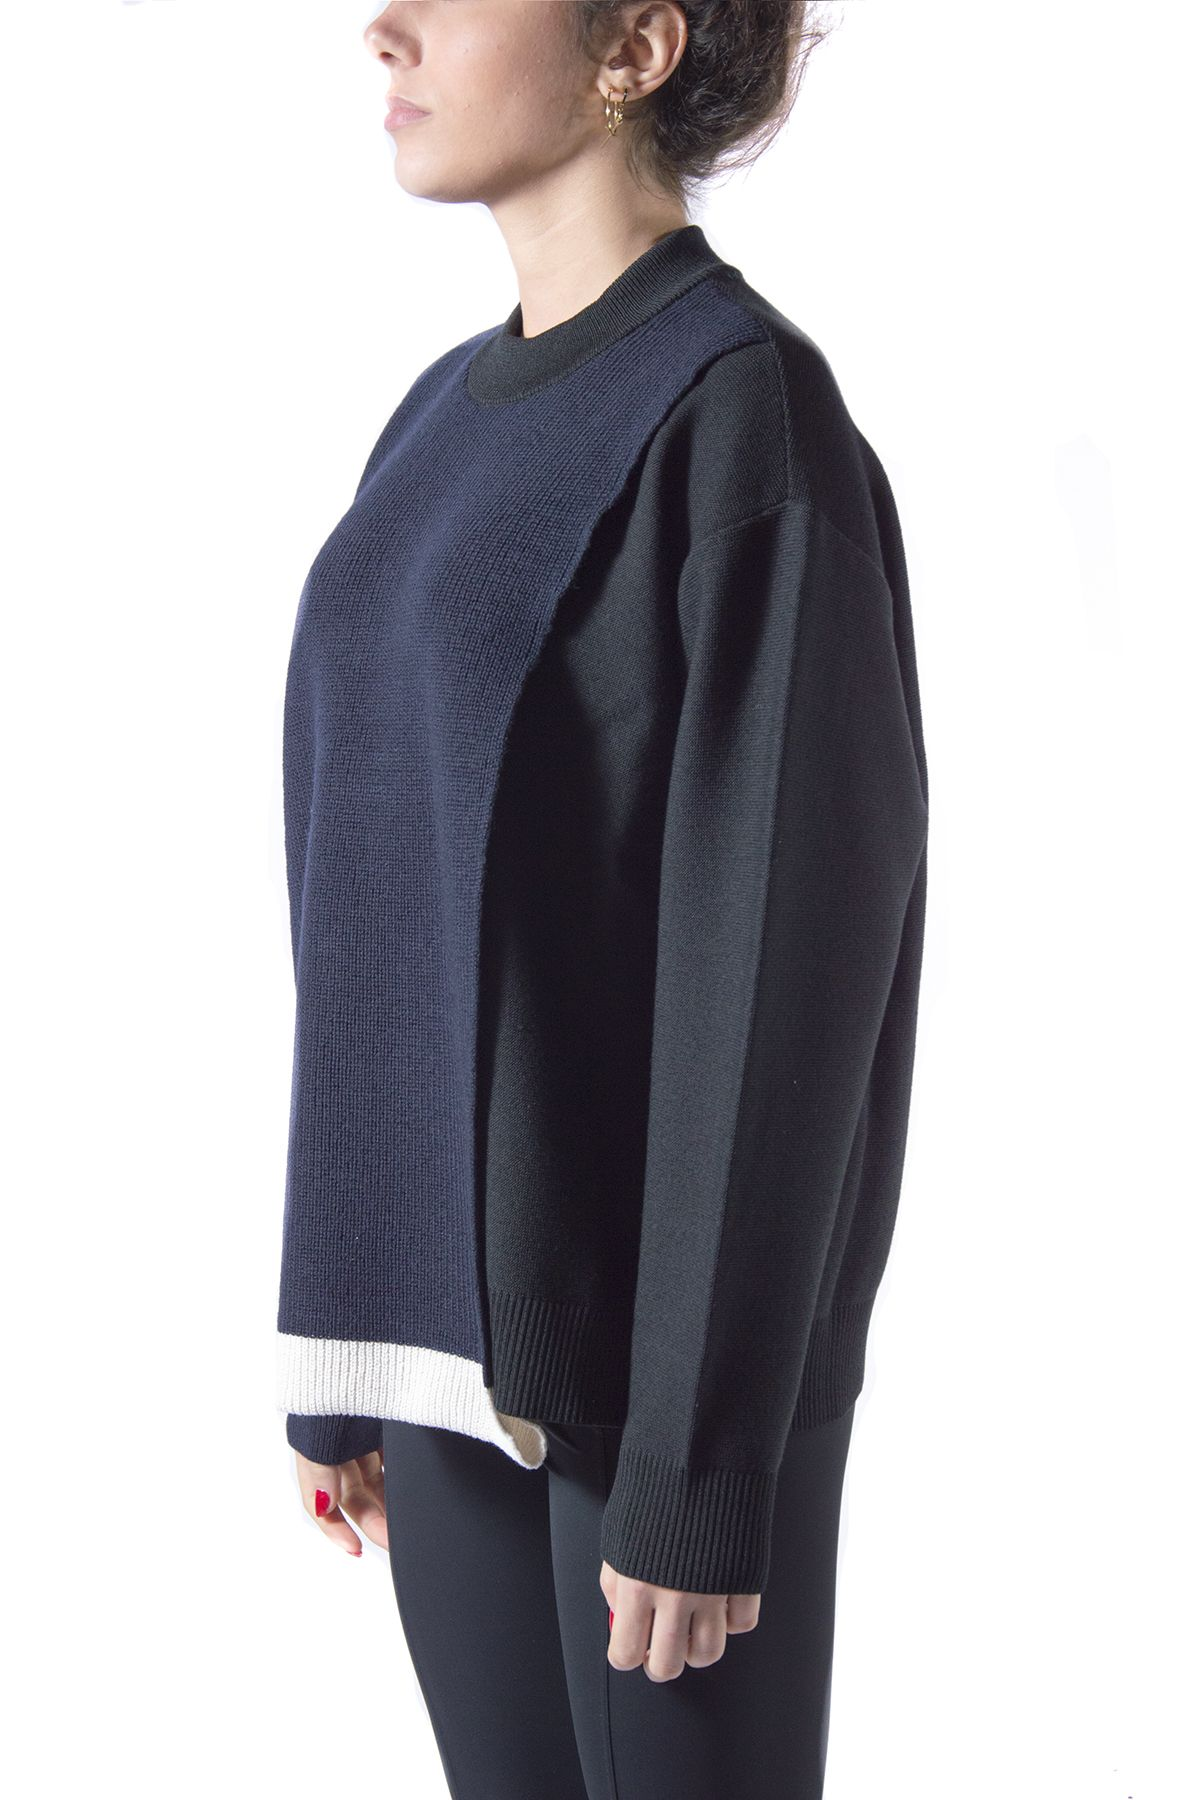 AMBUSH Sweaters AMBUSH WOMEN'S BLACK COTTON SWEATSHIRT